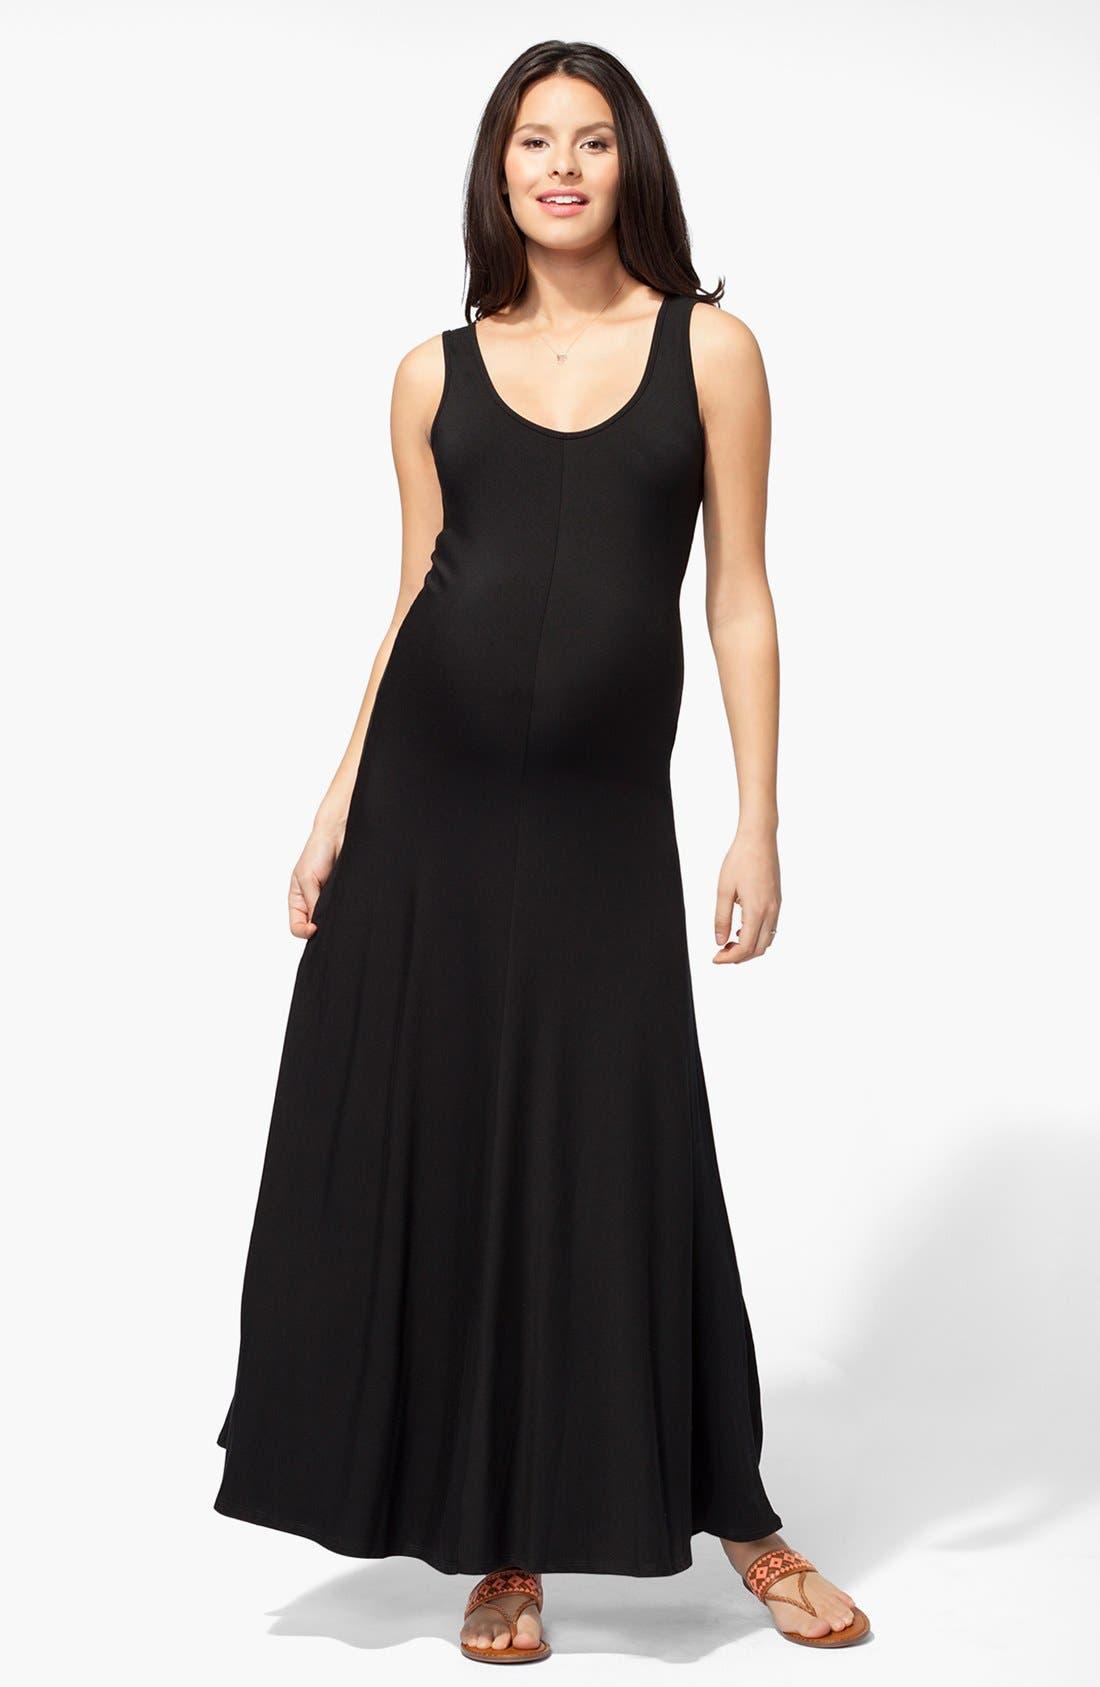 Main Image - Ingrid & Isabel® Tank Maternity Maxi Dress